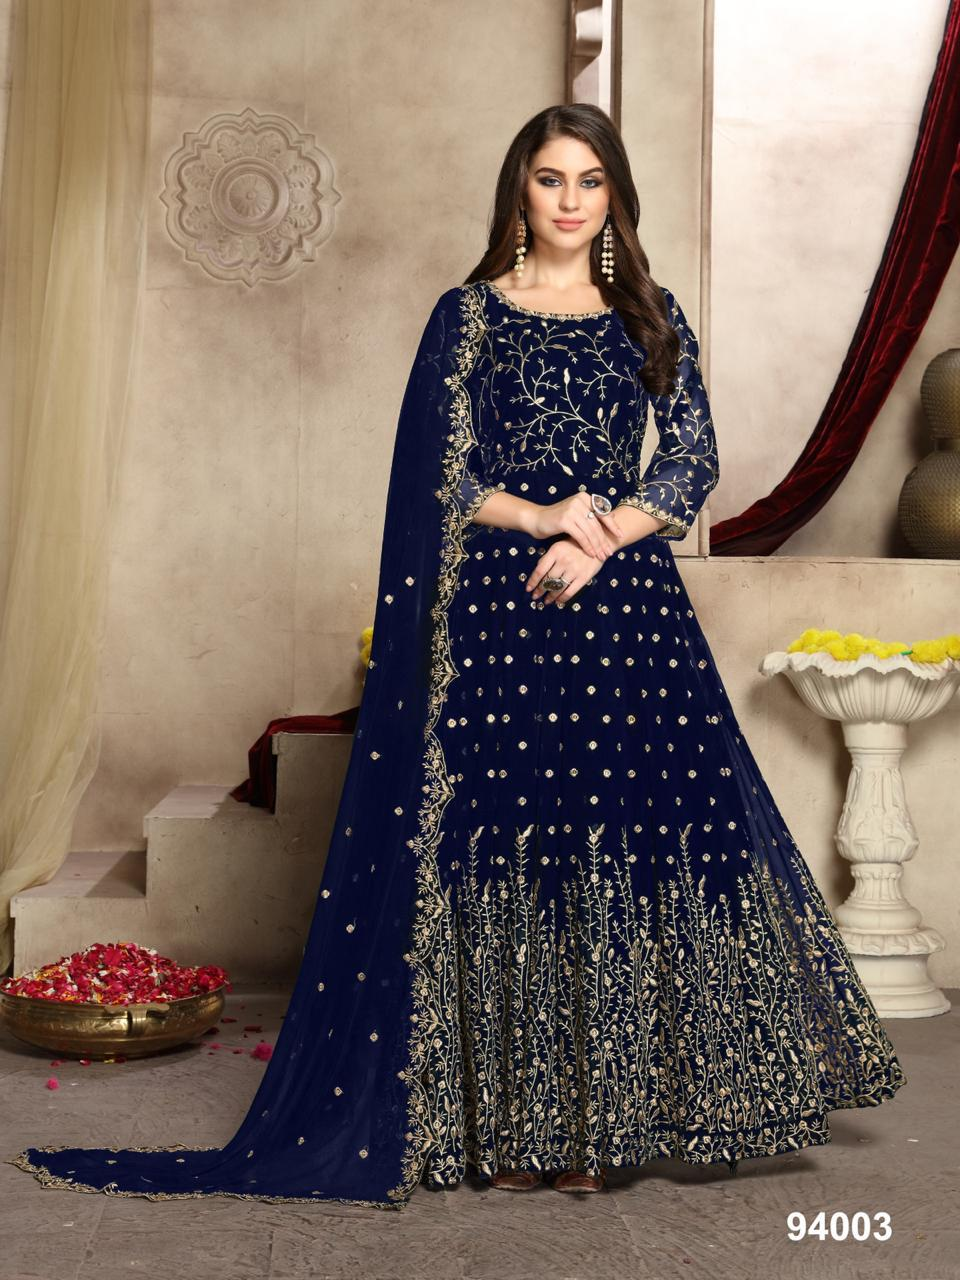 Twisha Aanaya Vol 94 Georgette Heavy Embroidery Anarkali Salwar Kameez